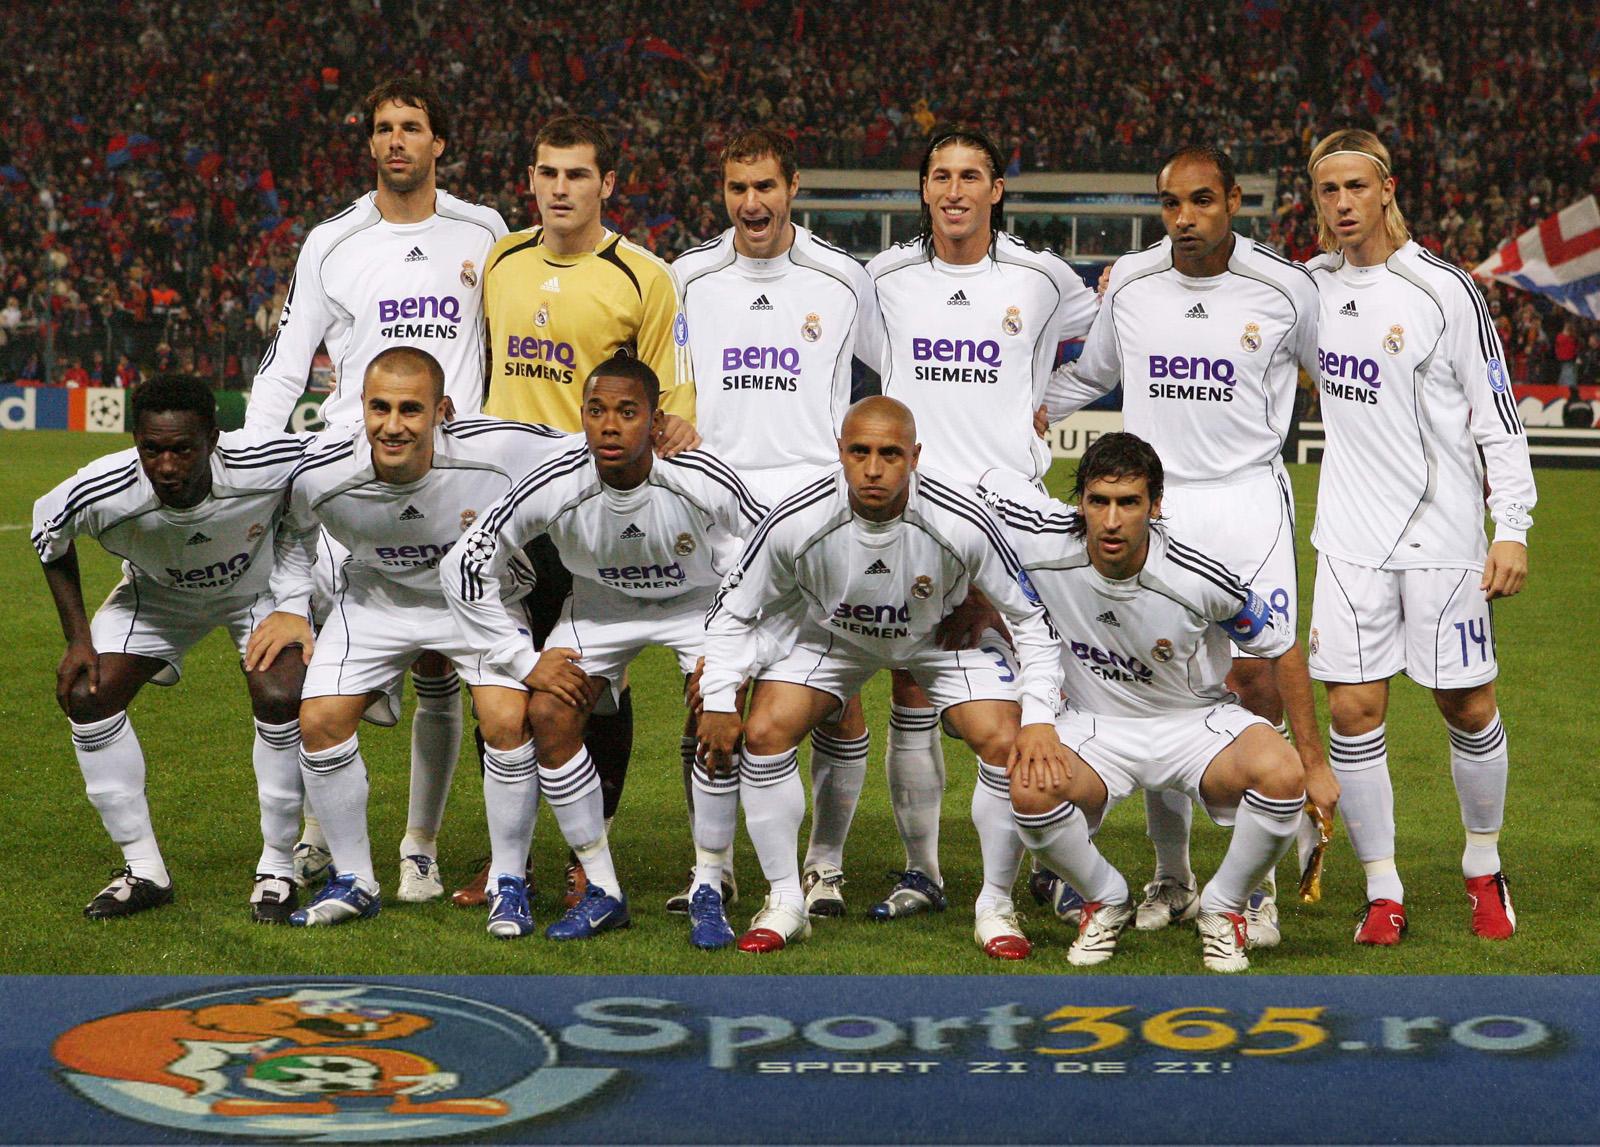 يتفرج مباراة ريال مدريد .